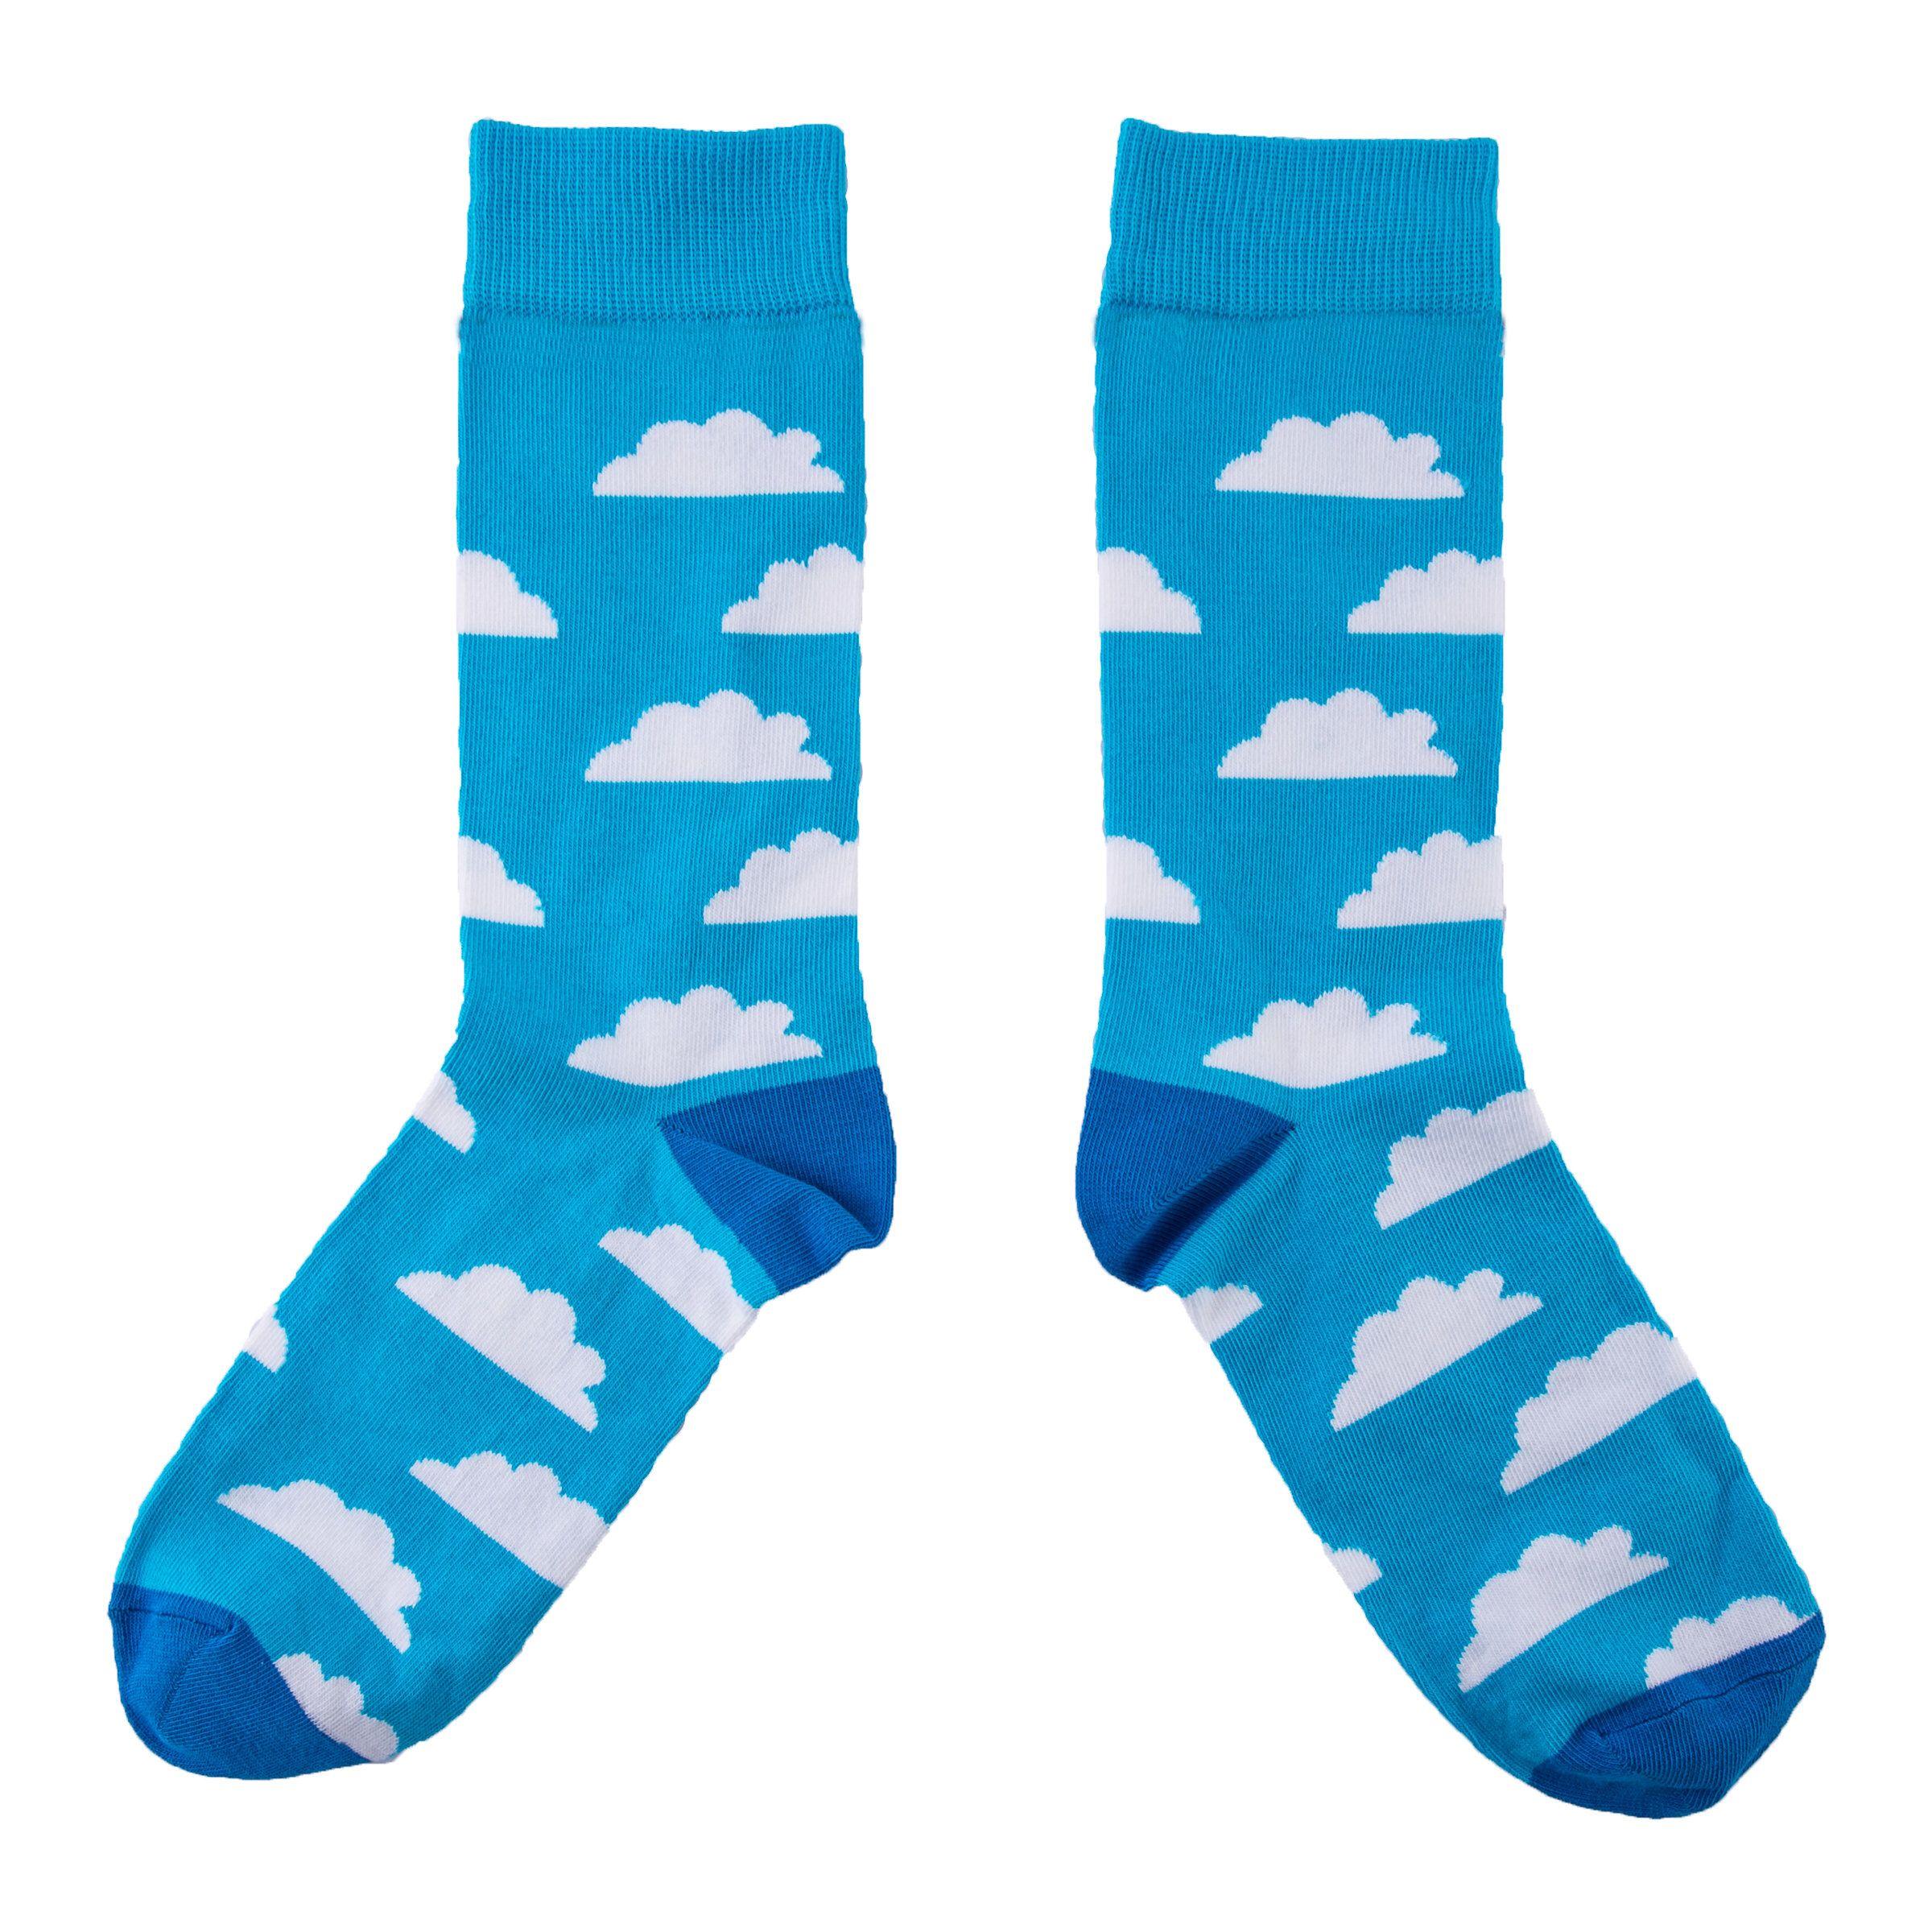 CLASSIC COTTON /& LYCRA FITS UK 11-14 MENS LUXURY BIG FOOT SOCKS SUPER SOFT